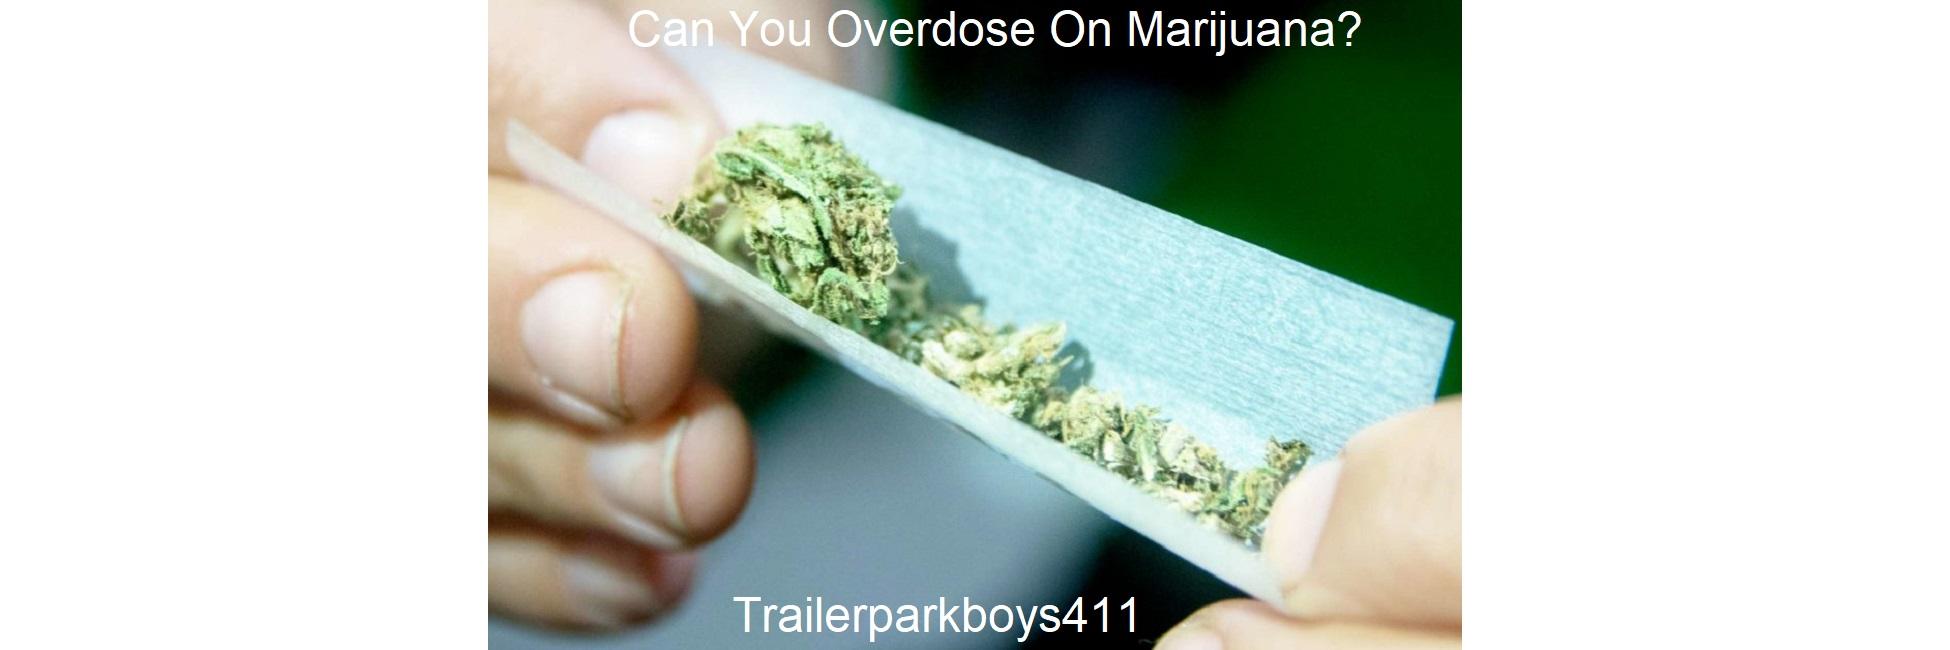 Can You Overdose On Marijuana